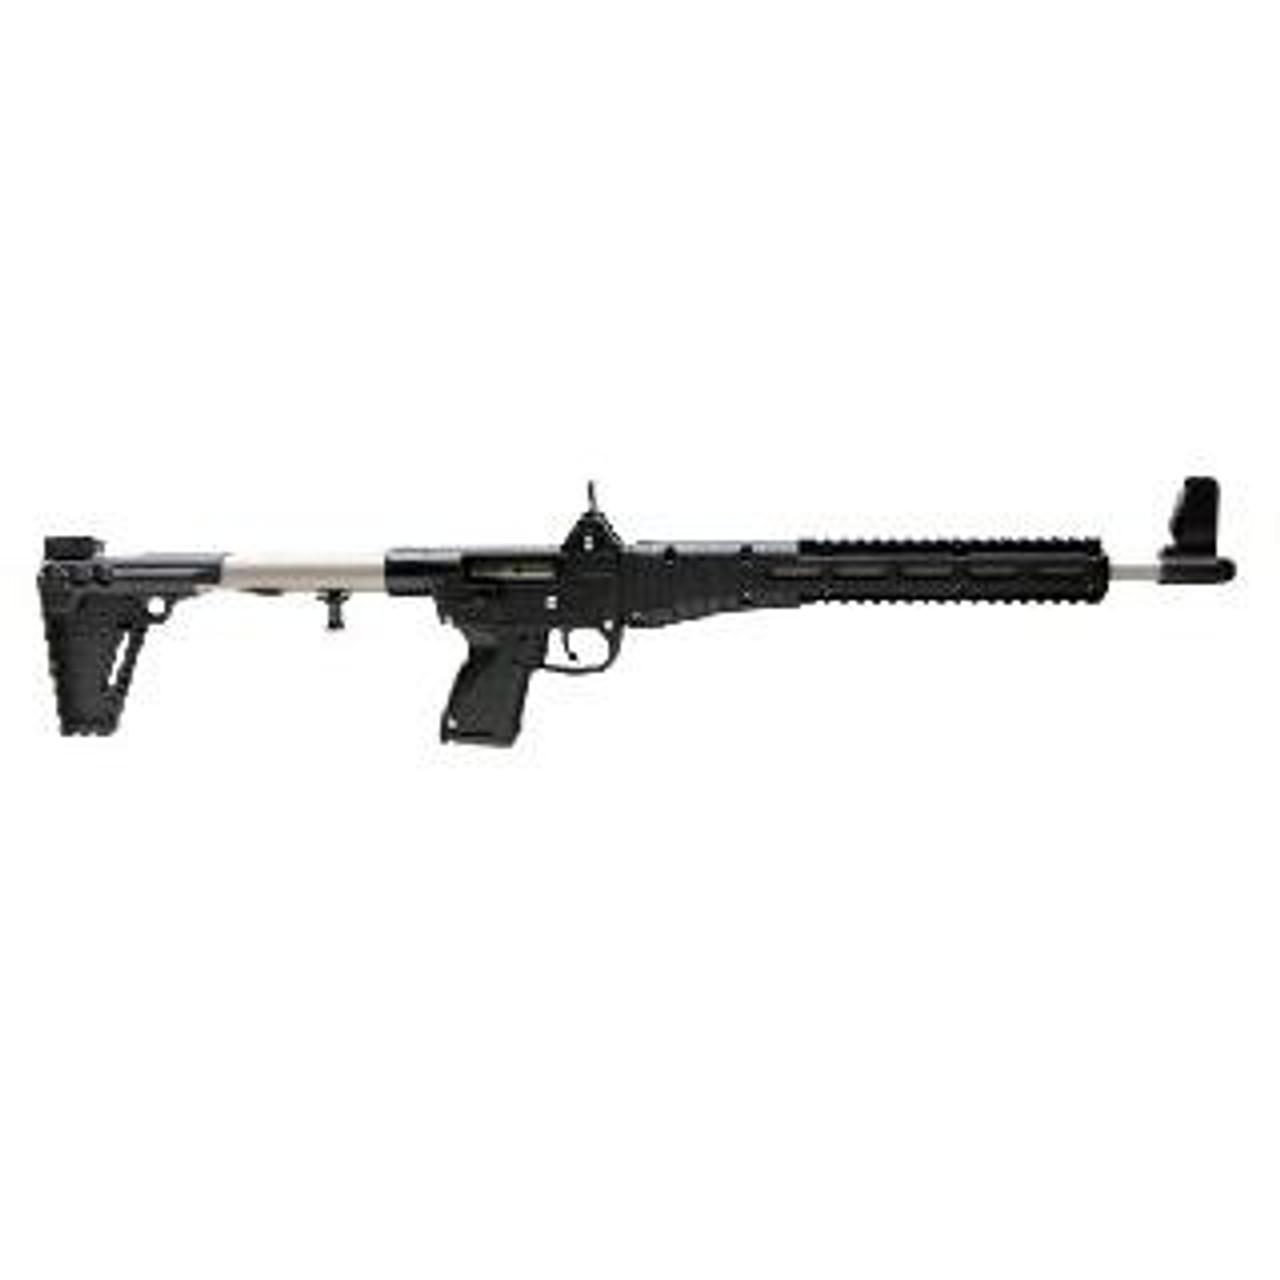 Kel Tec Sub2000 Gen 2 .40S&W NiB (Glock 22)- CALIFORNIA LEGAL